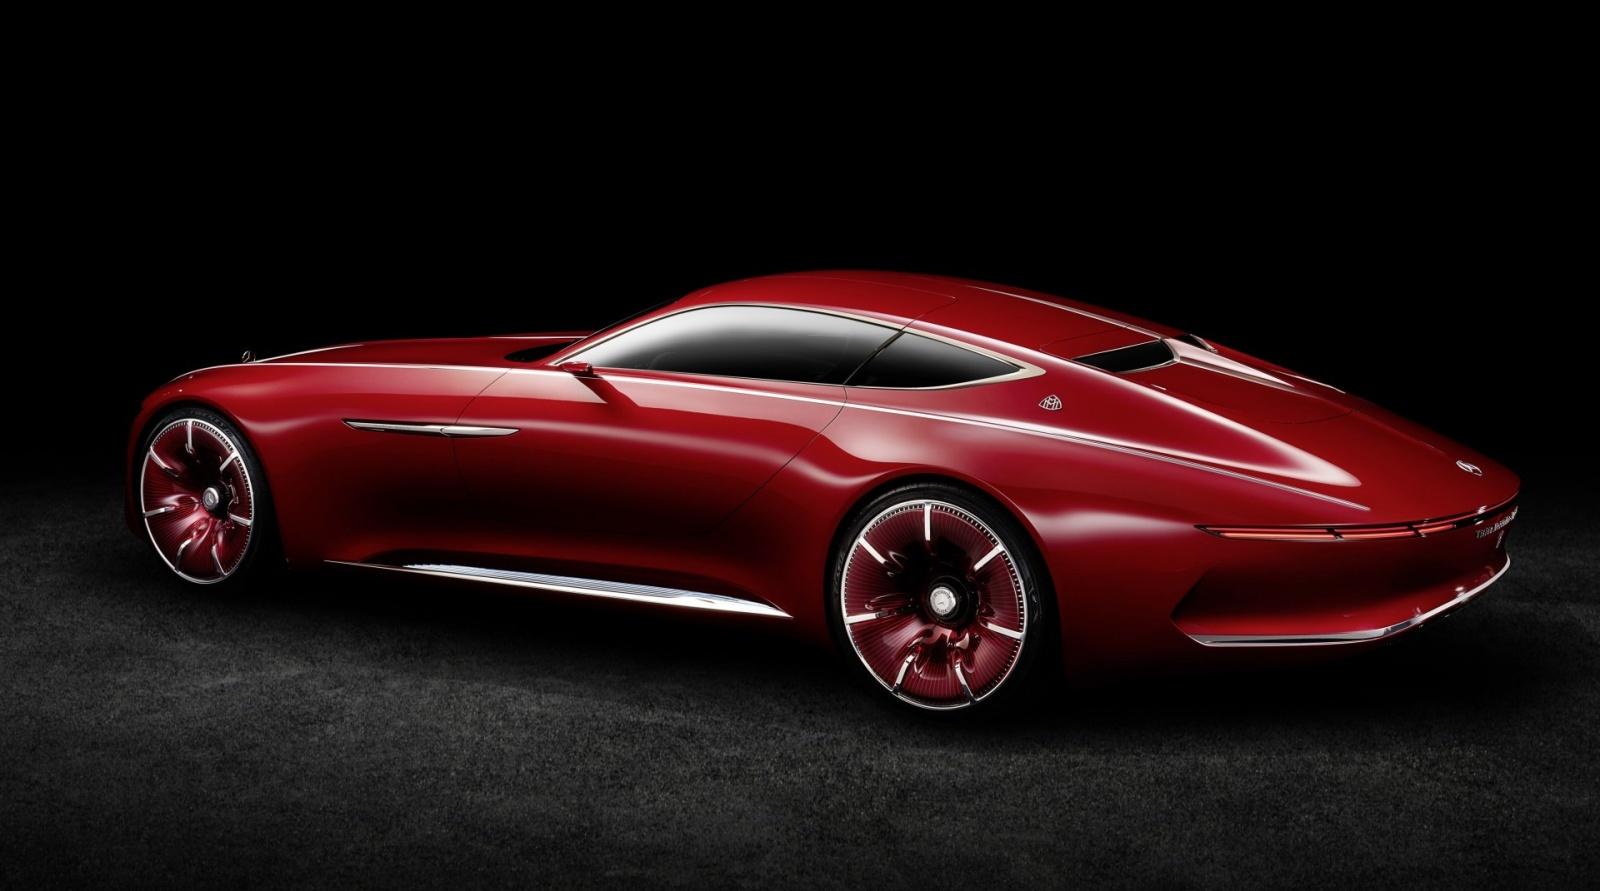 Проект шестиметрового электрокара Vision Mercedes-Maybach 6 - 4